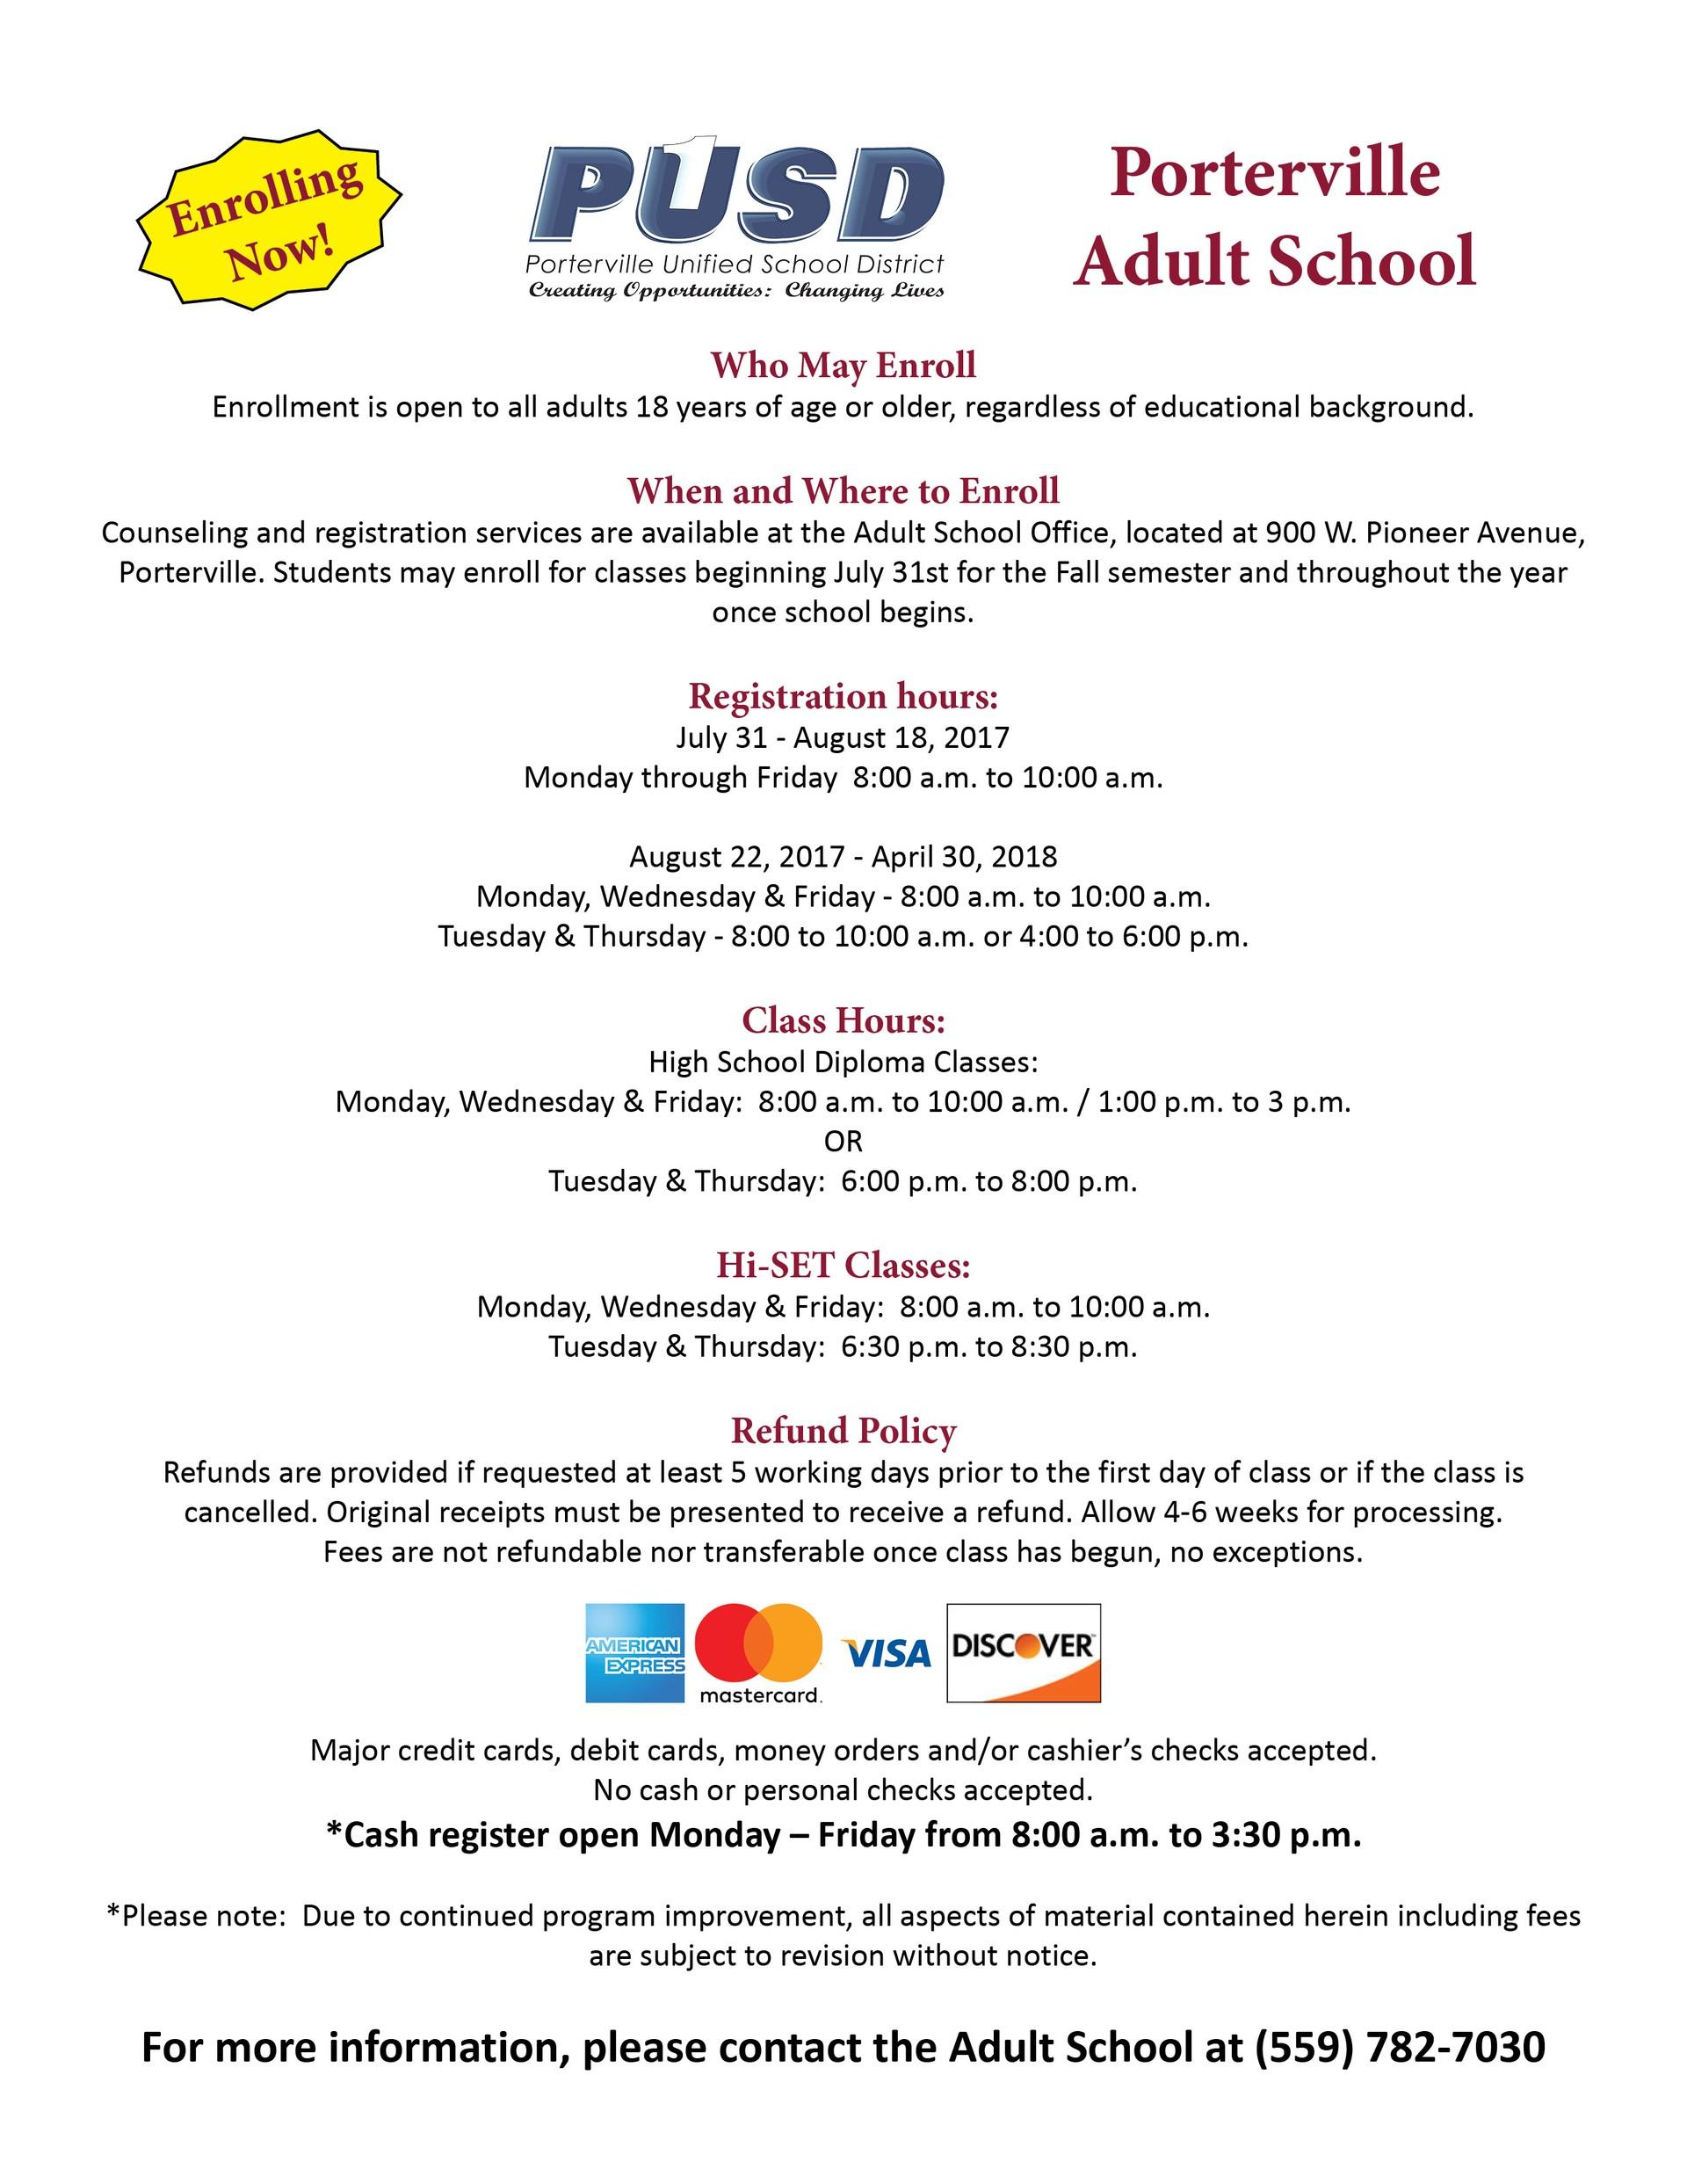 Adult School Open Enrollment